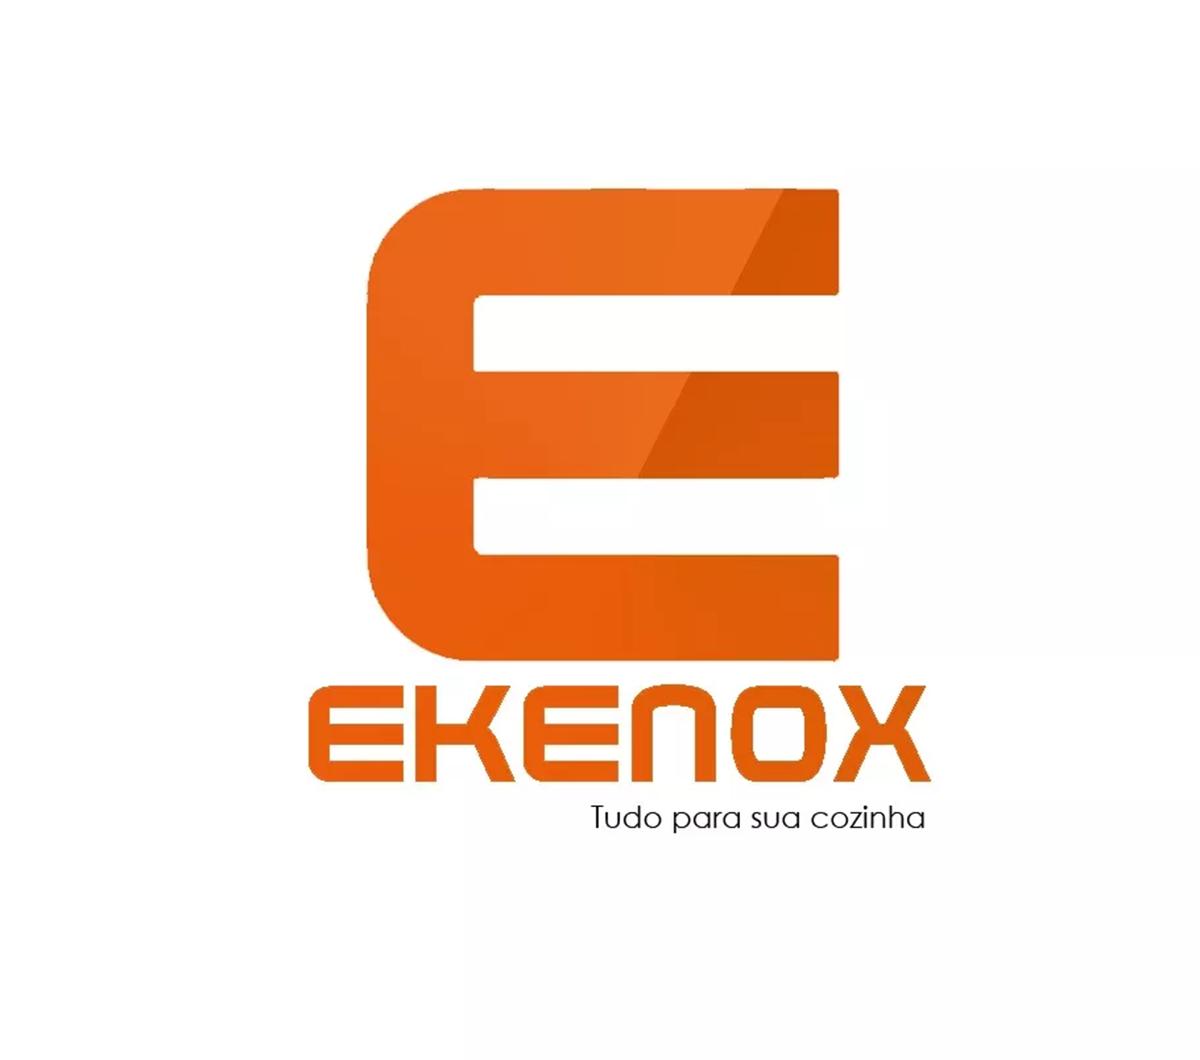 Kit 10 Porta Guardanapos  - EKENOX- Equipamentos Industriais